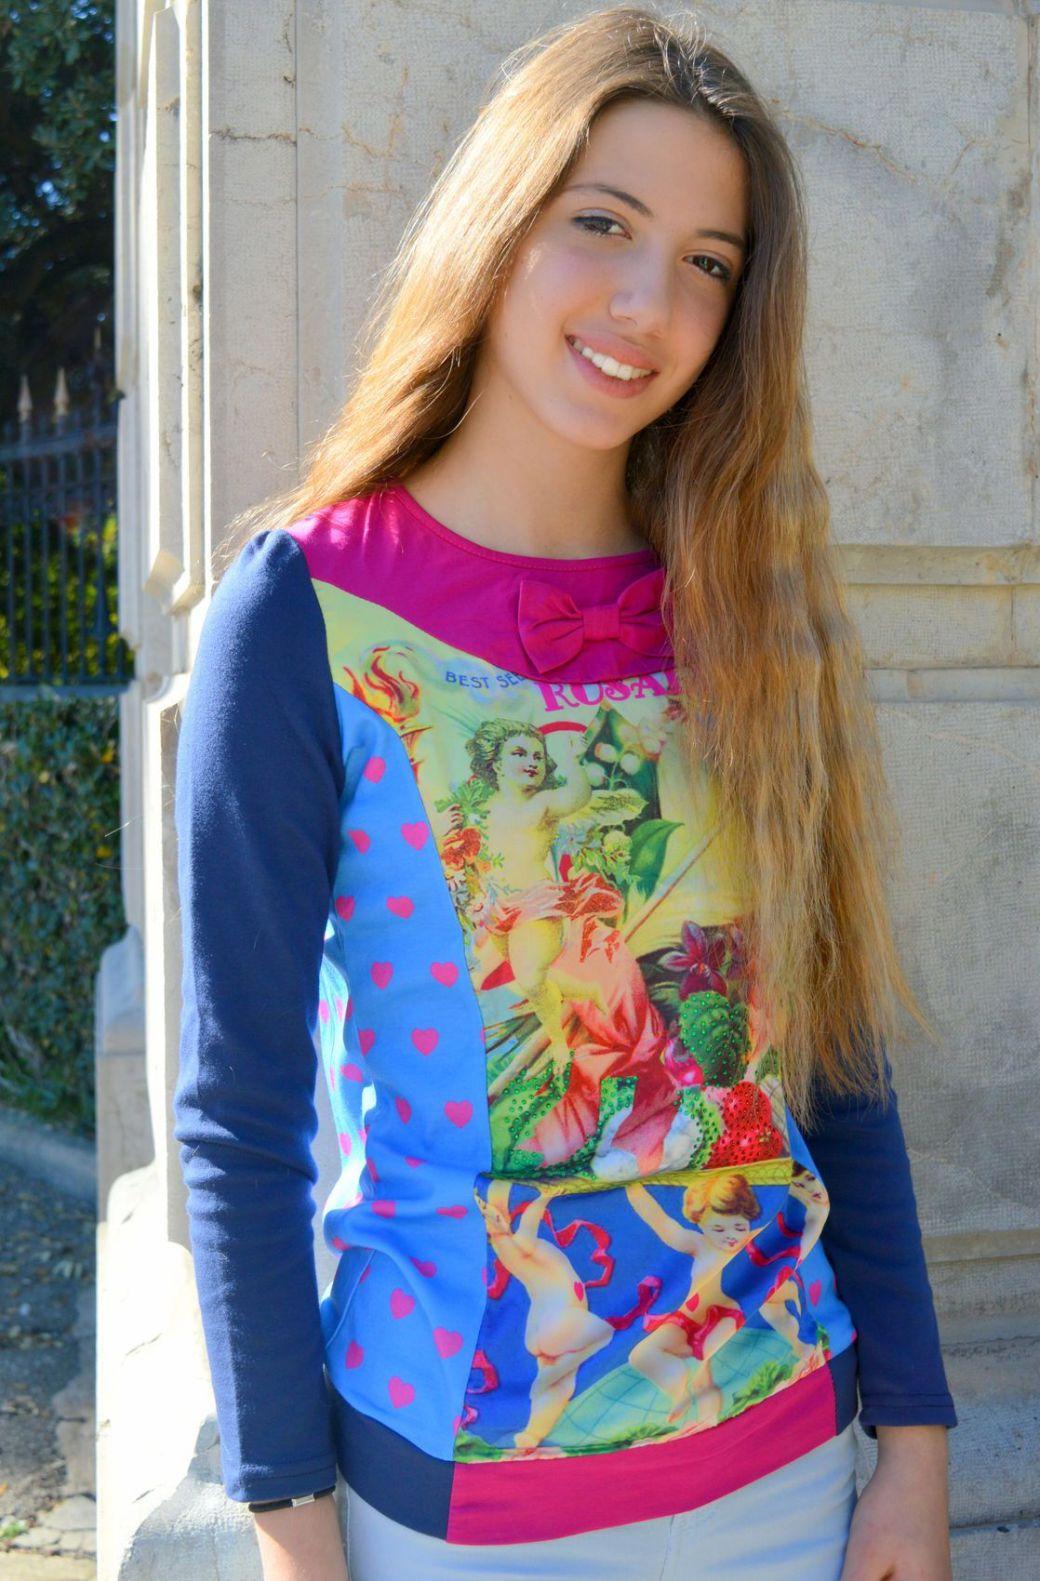 rosalita señoritas moda infantil y juvenil 1